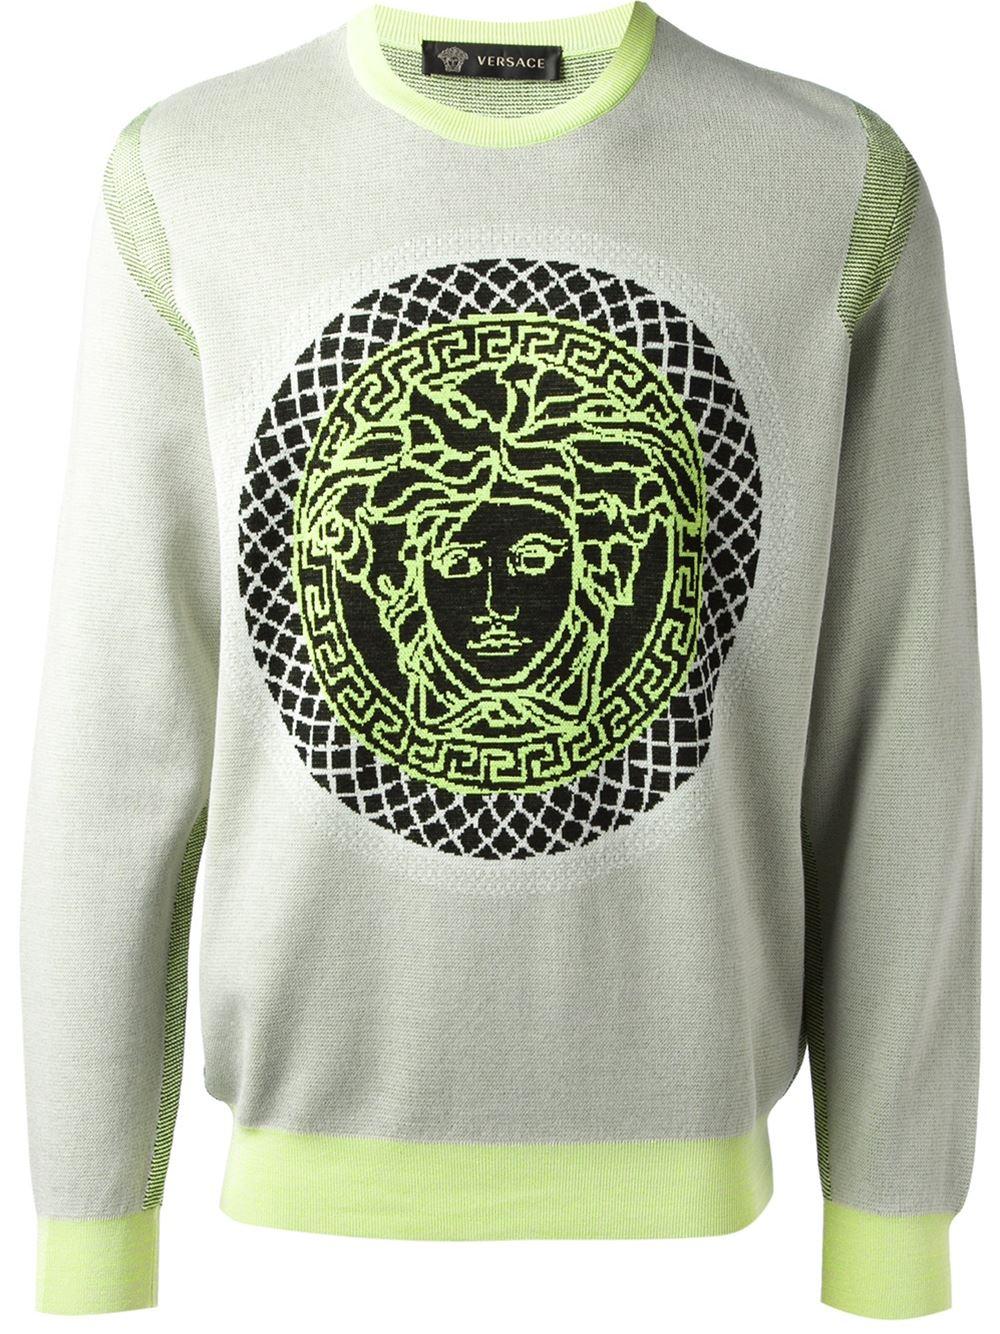 versace-medusa-print-sweater